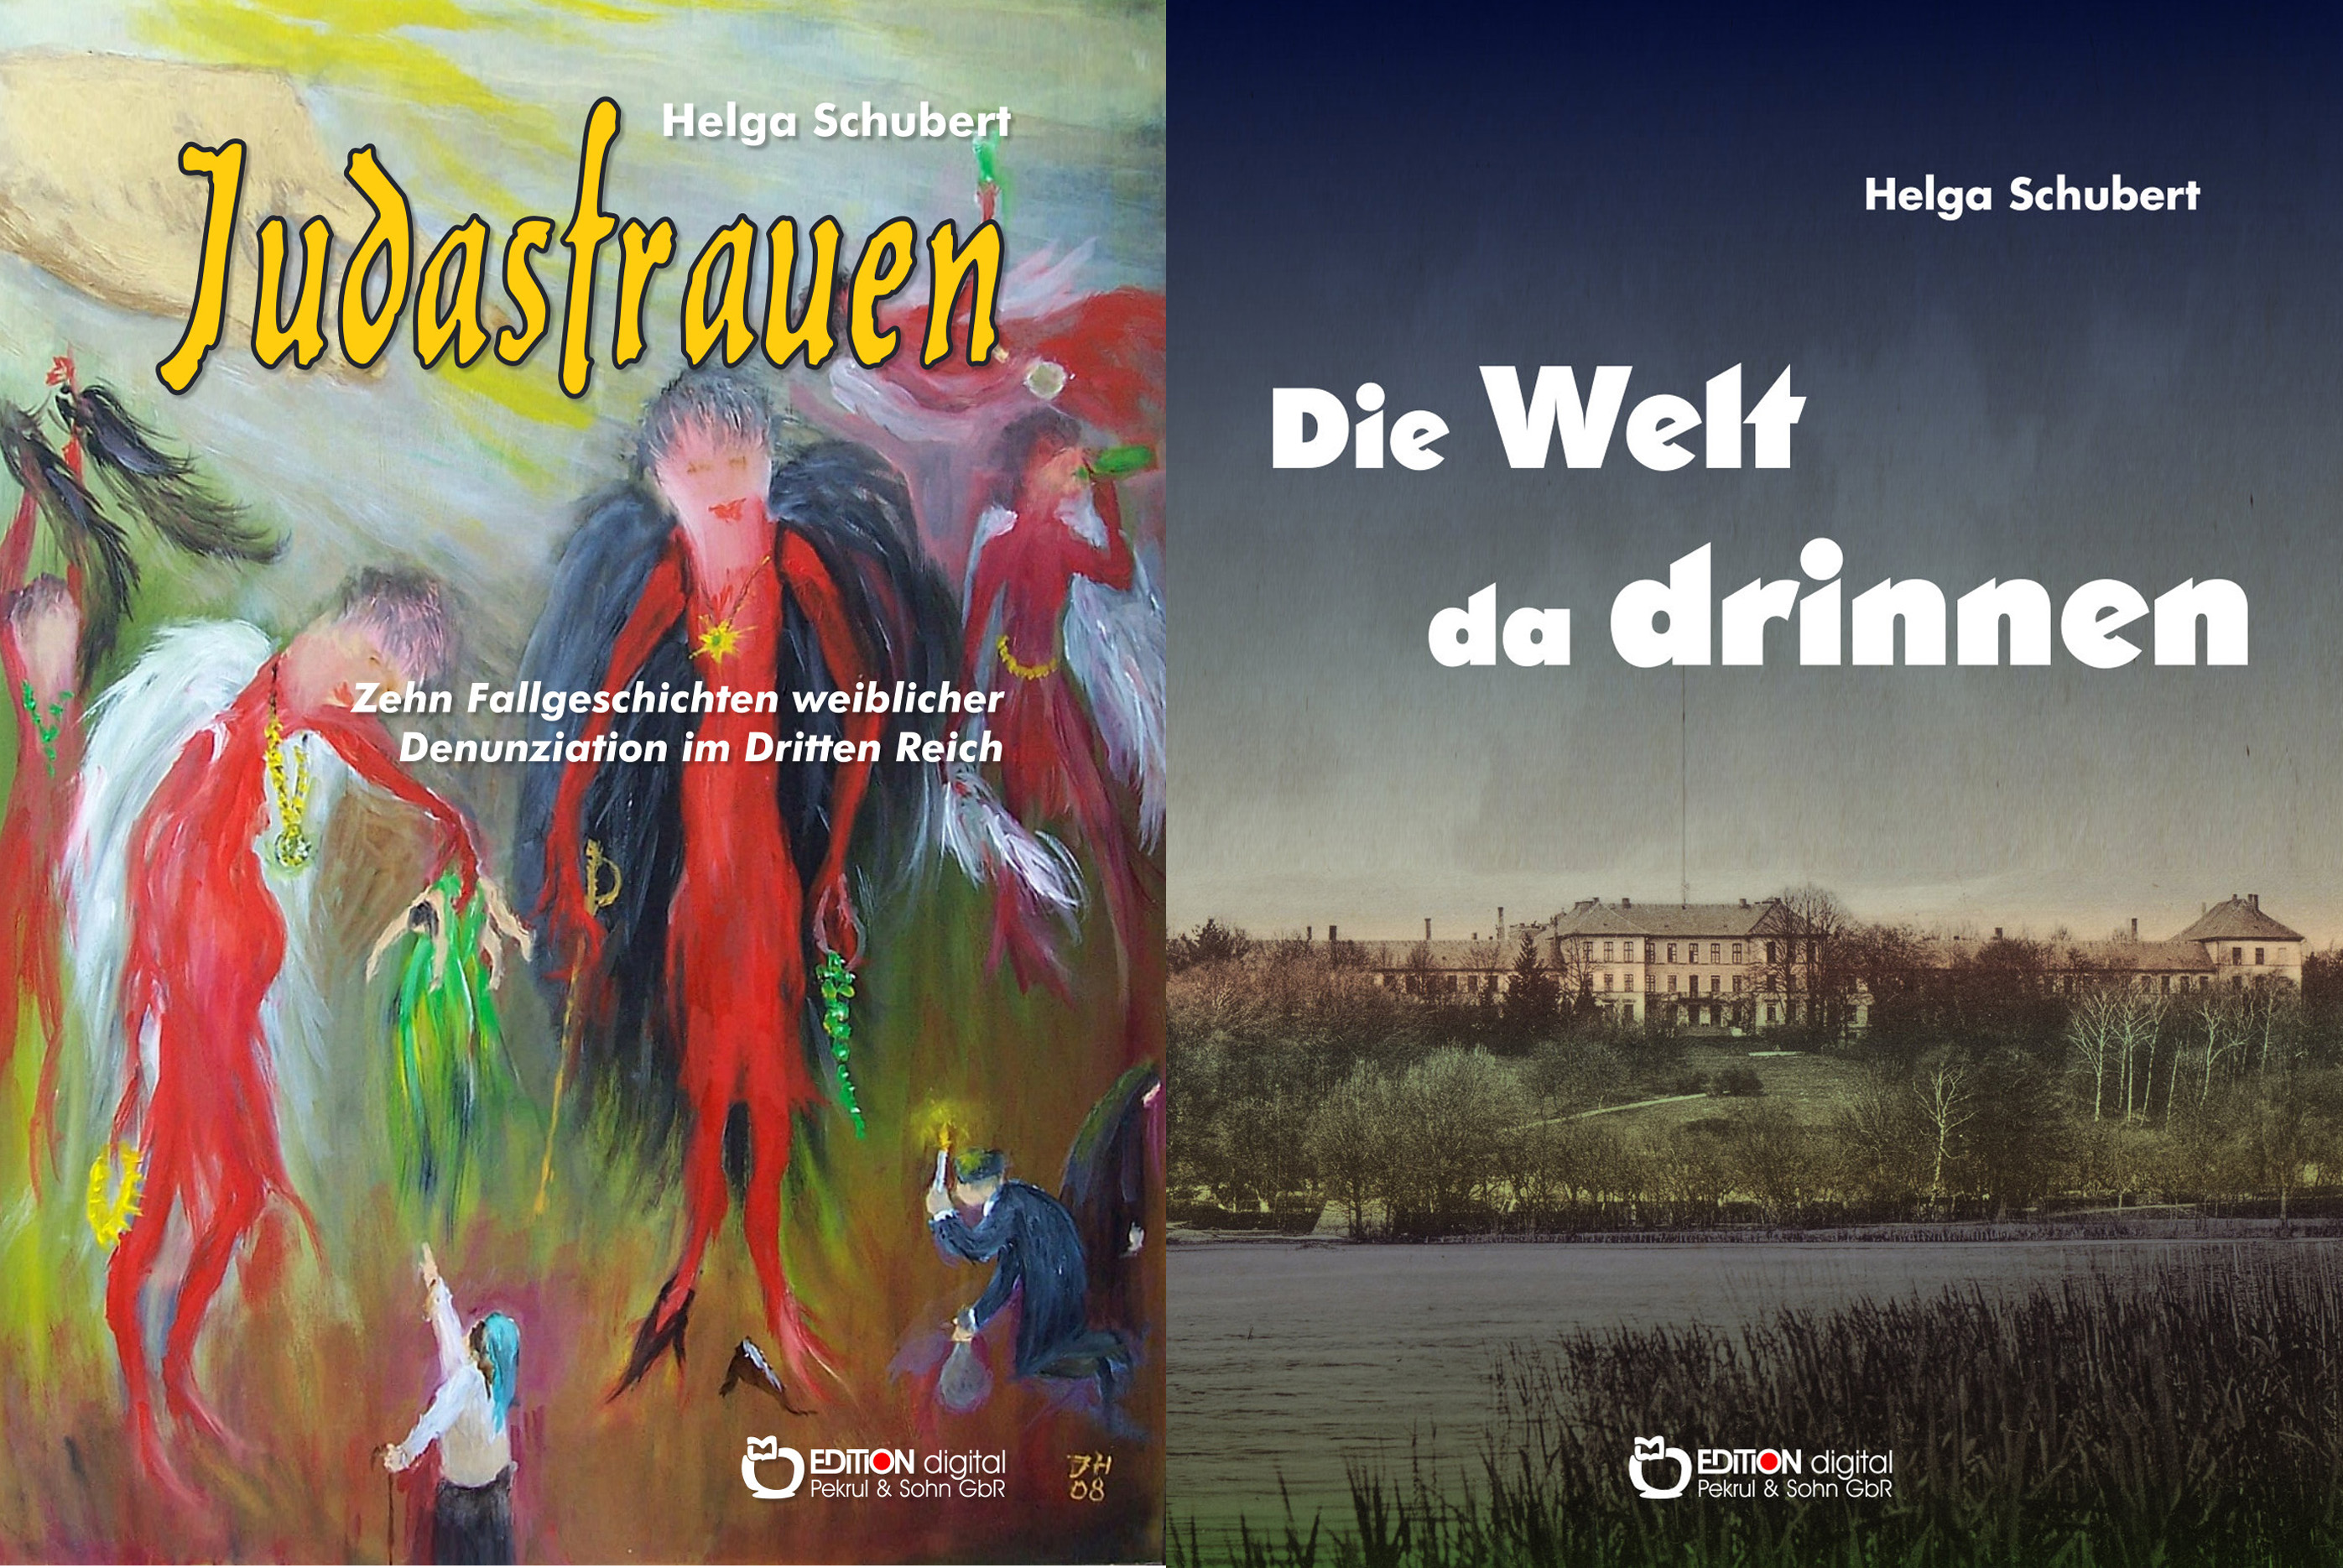 2013-08-29 Schubert_Helga